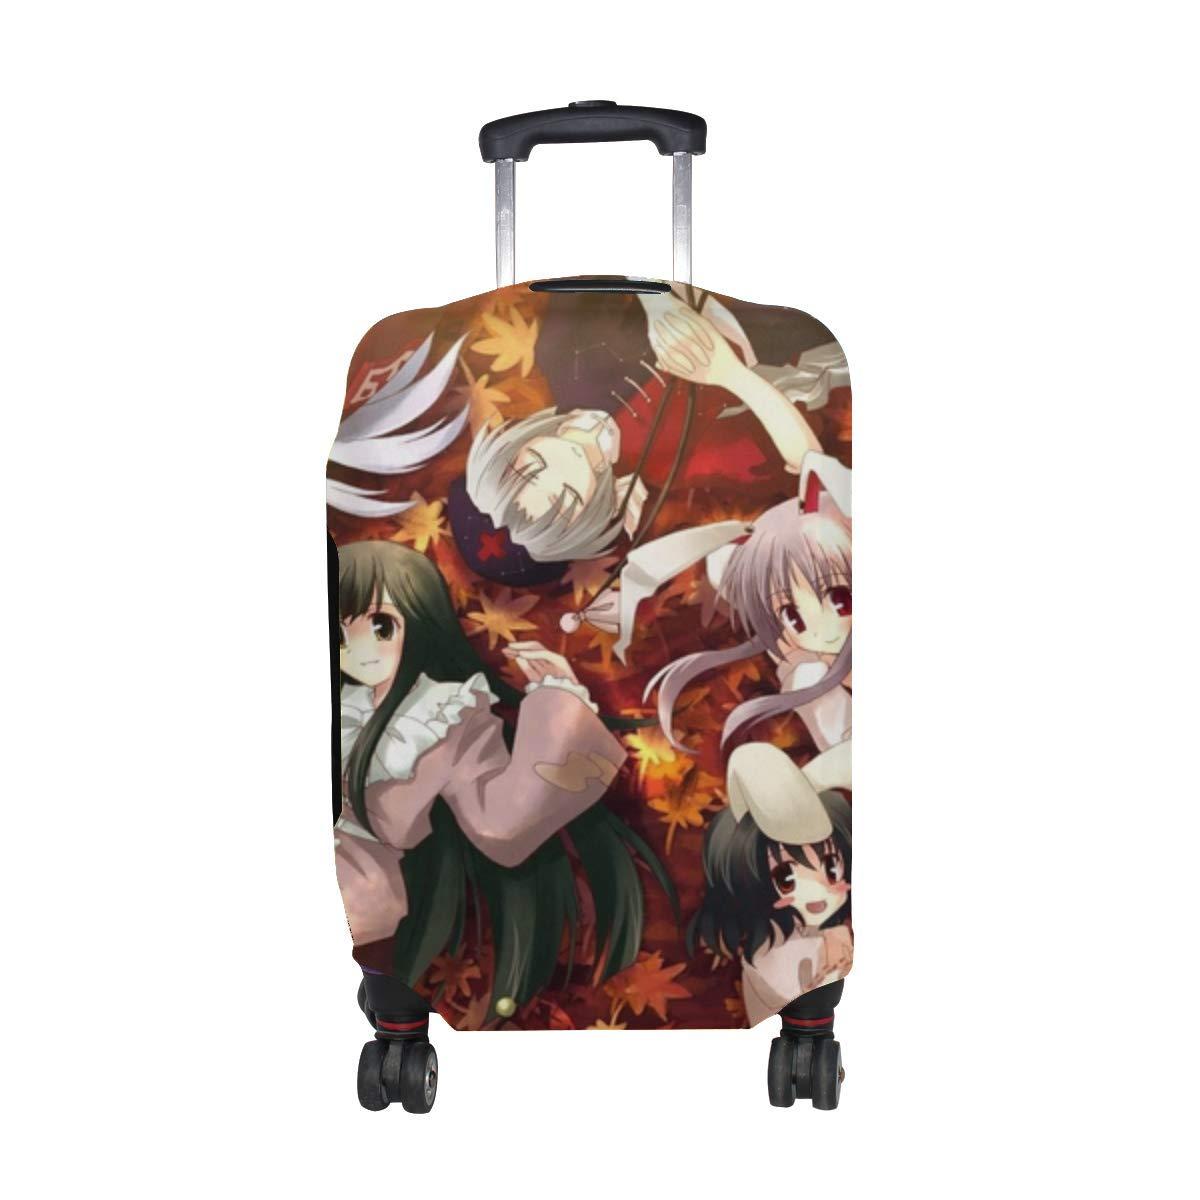 Maxm Mokou Houraisan Kaguya Inaba Yagokoro Eirin Yuuki Tatsuya Girls Leaves Autumn Pattern Print Travel Luggage Protector Baggage Suitcase Cover Fits 18-21 Inch Luggage